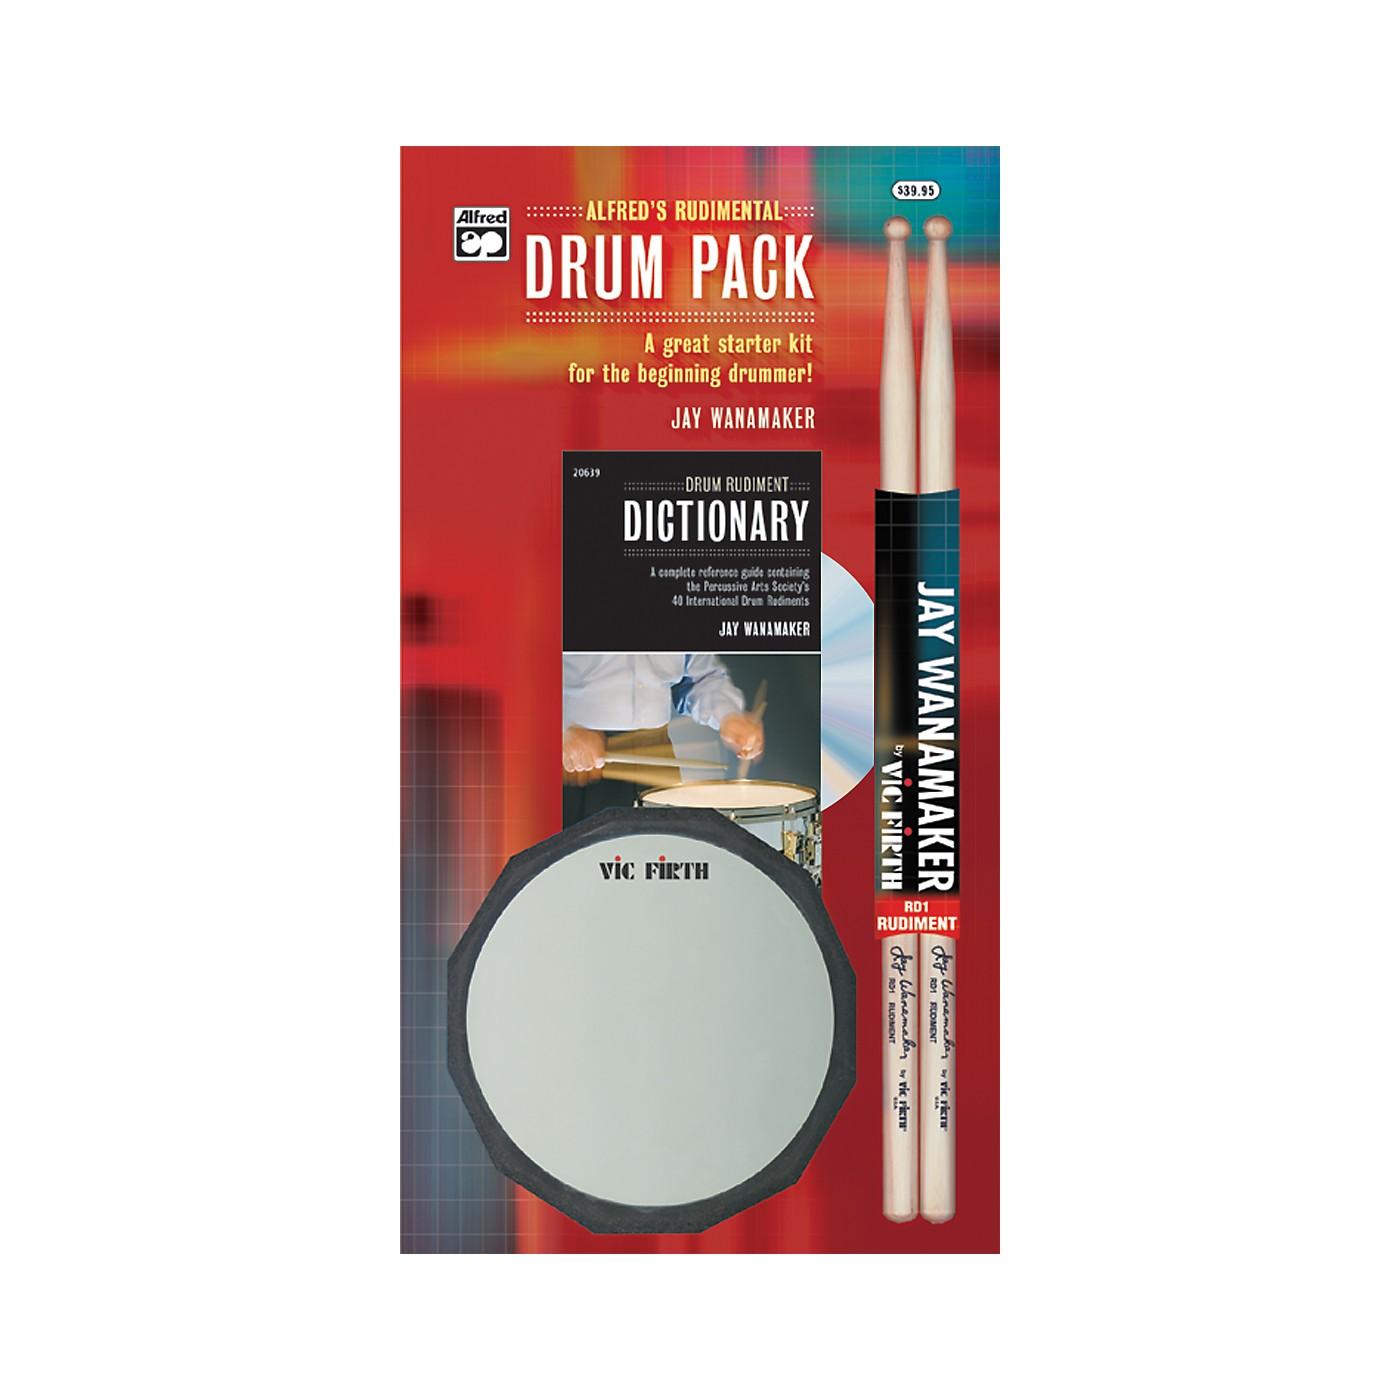 Alfred Rudimental Drum Pack Handy Guide CD Drum Pad & Sticks thumbnail